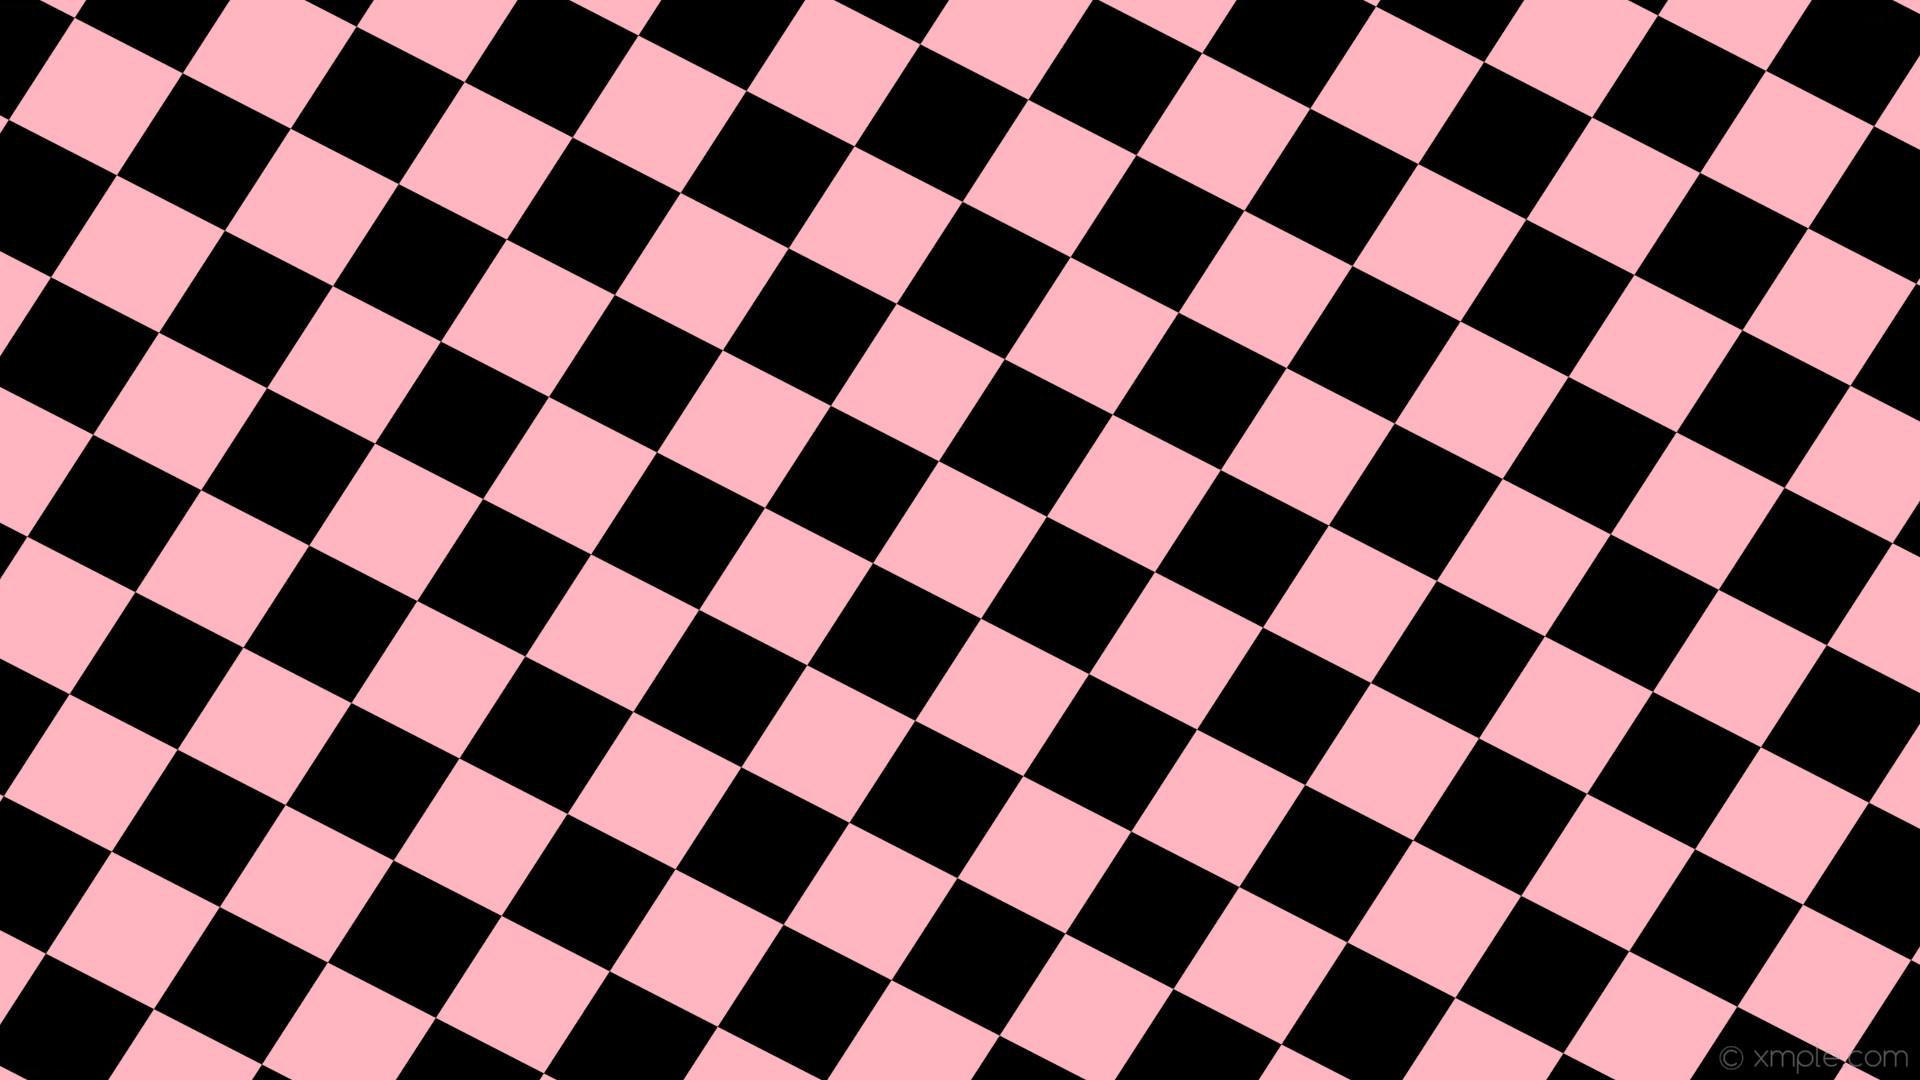 wallpaper black pink diamond lozenge rhombus light pink #ffb6c1 #000000 15°  180px 163px